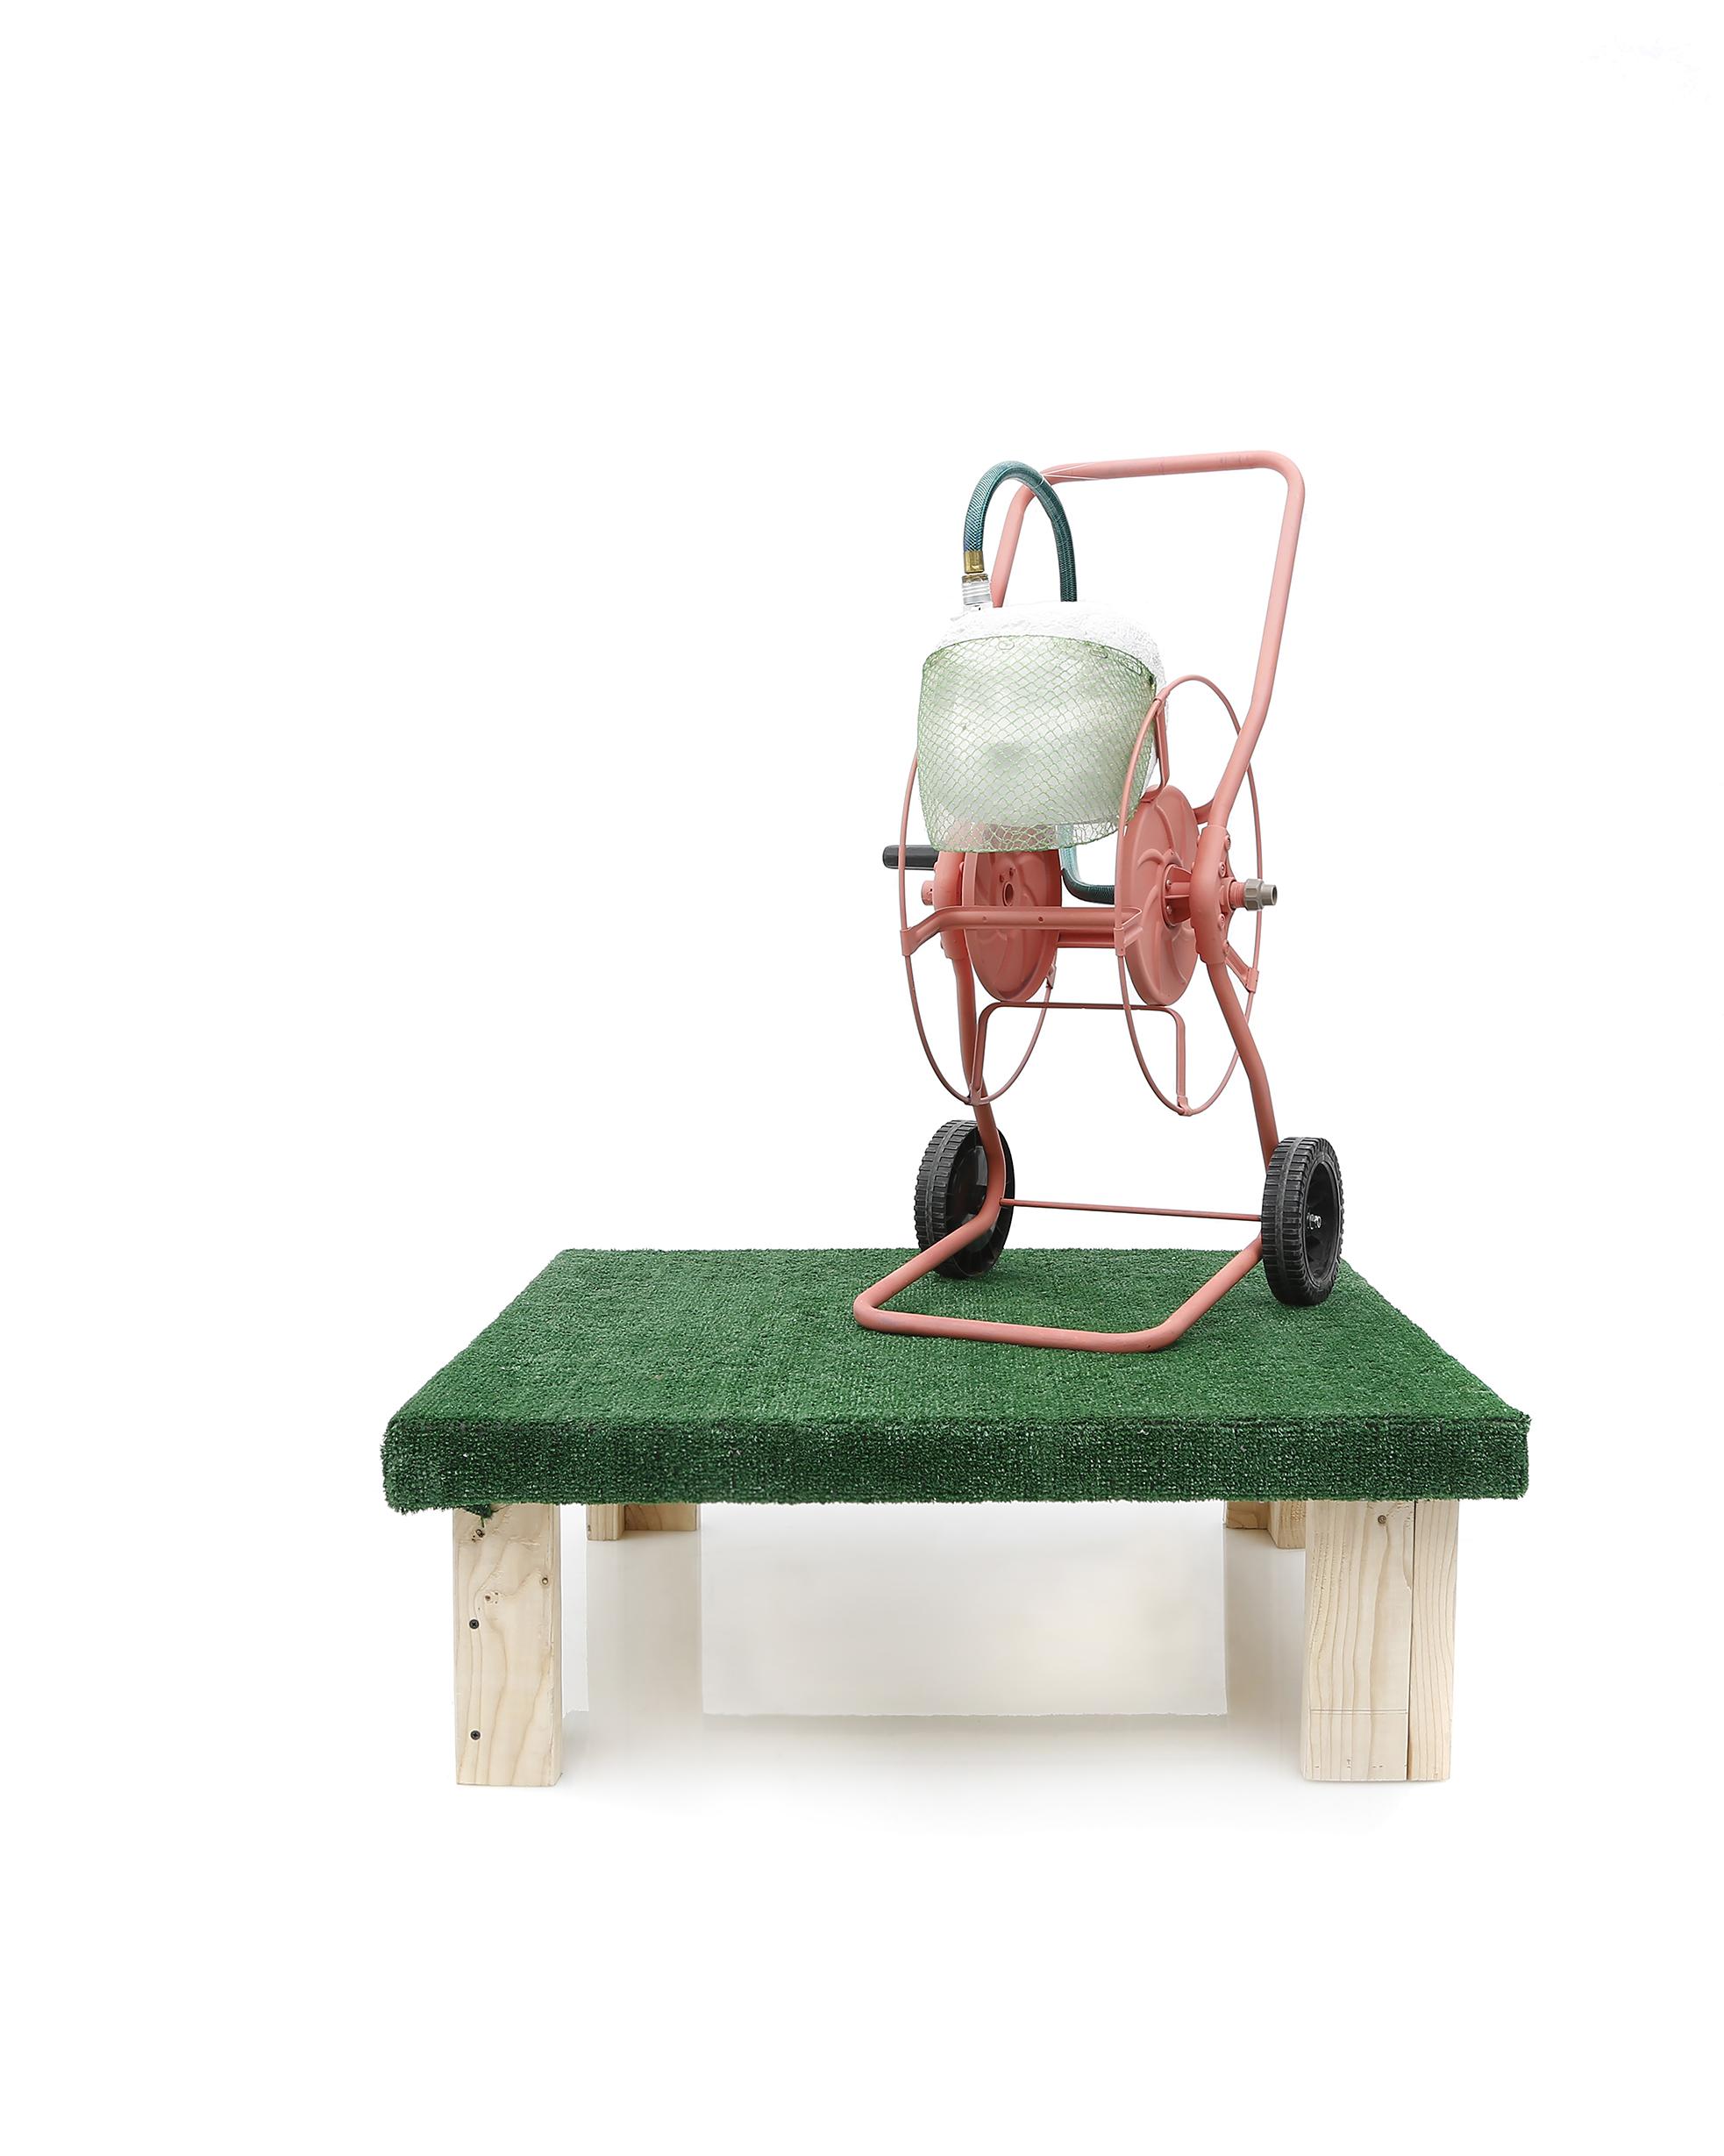 YES Machine, 2017, Hose reel, face shield, plastic mesh, foam, aqua resin, artificial grass, wood, paint